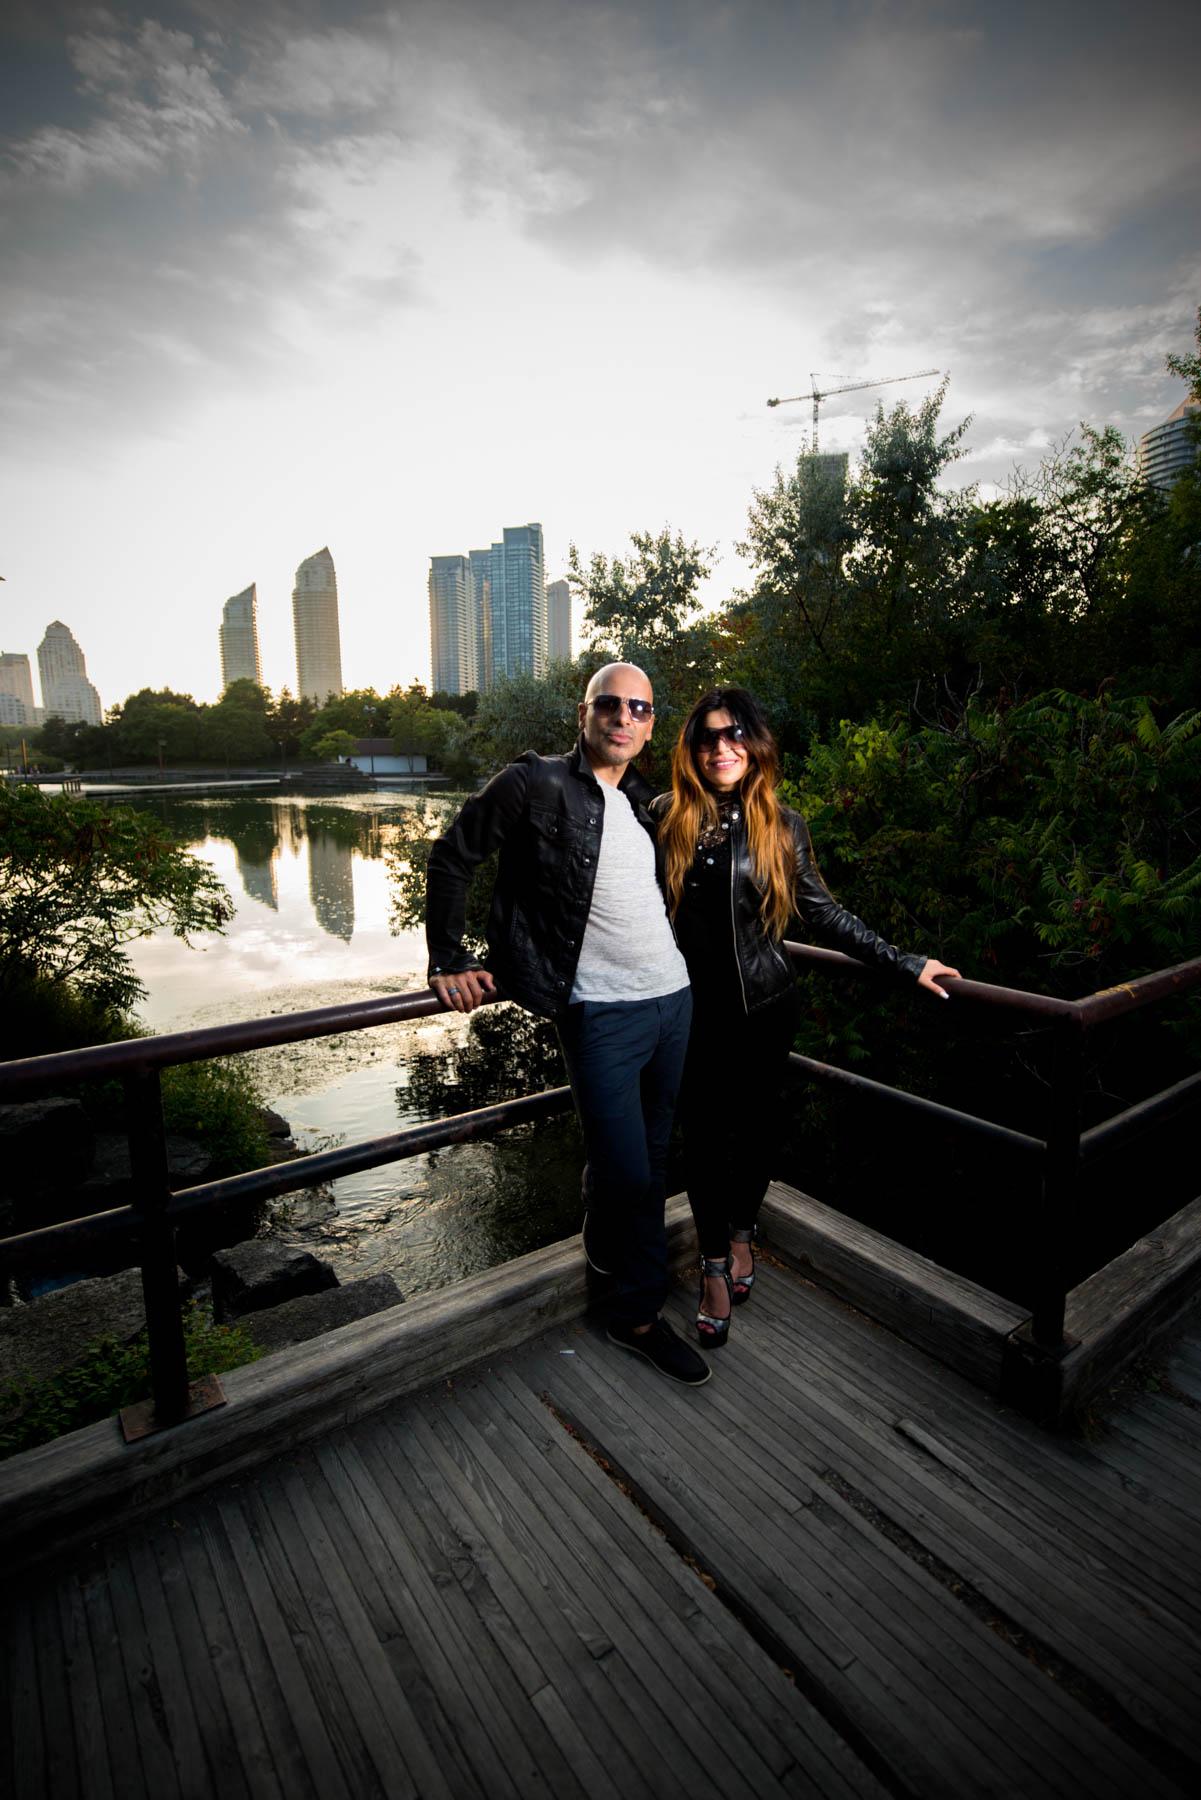 050 - Engagement FL Humber Bay Park - Toronto